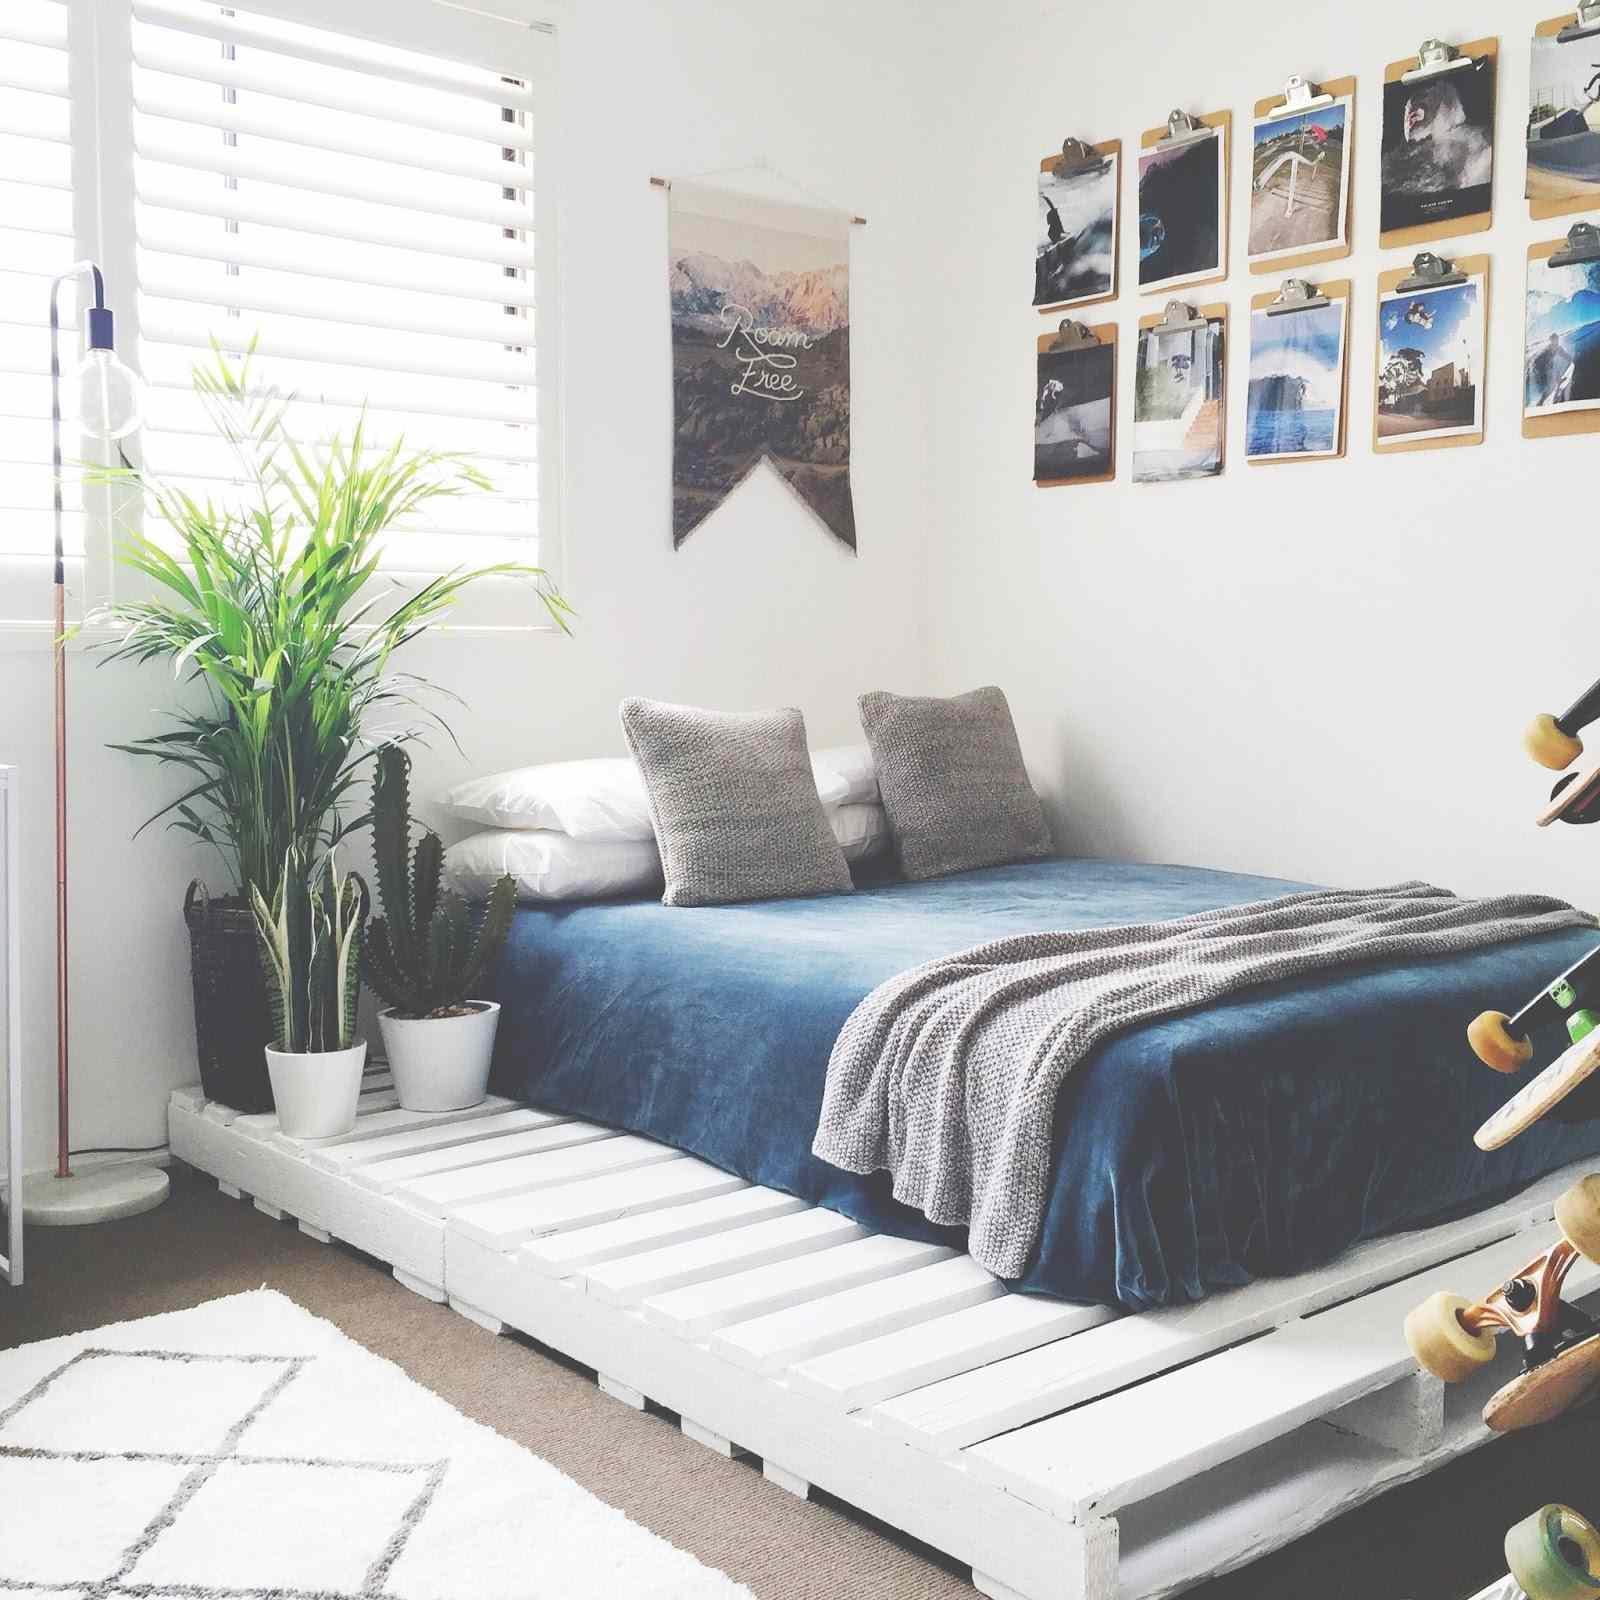 16 Free Diy Pallet Bed Plans